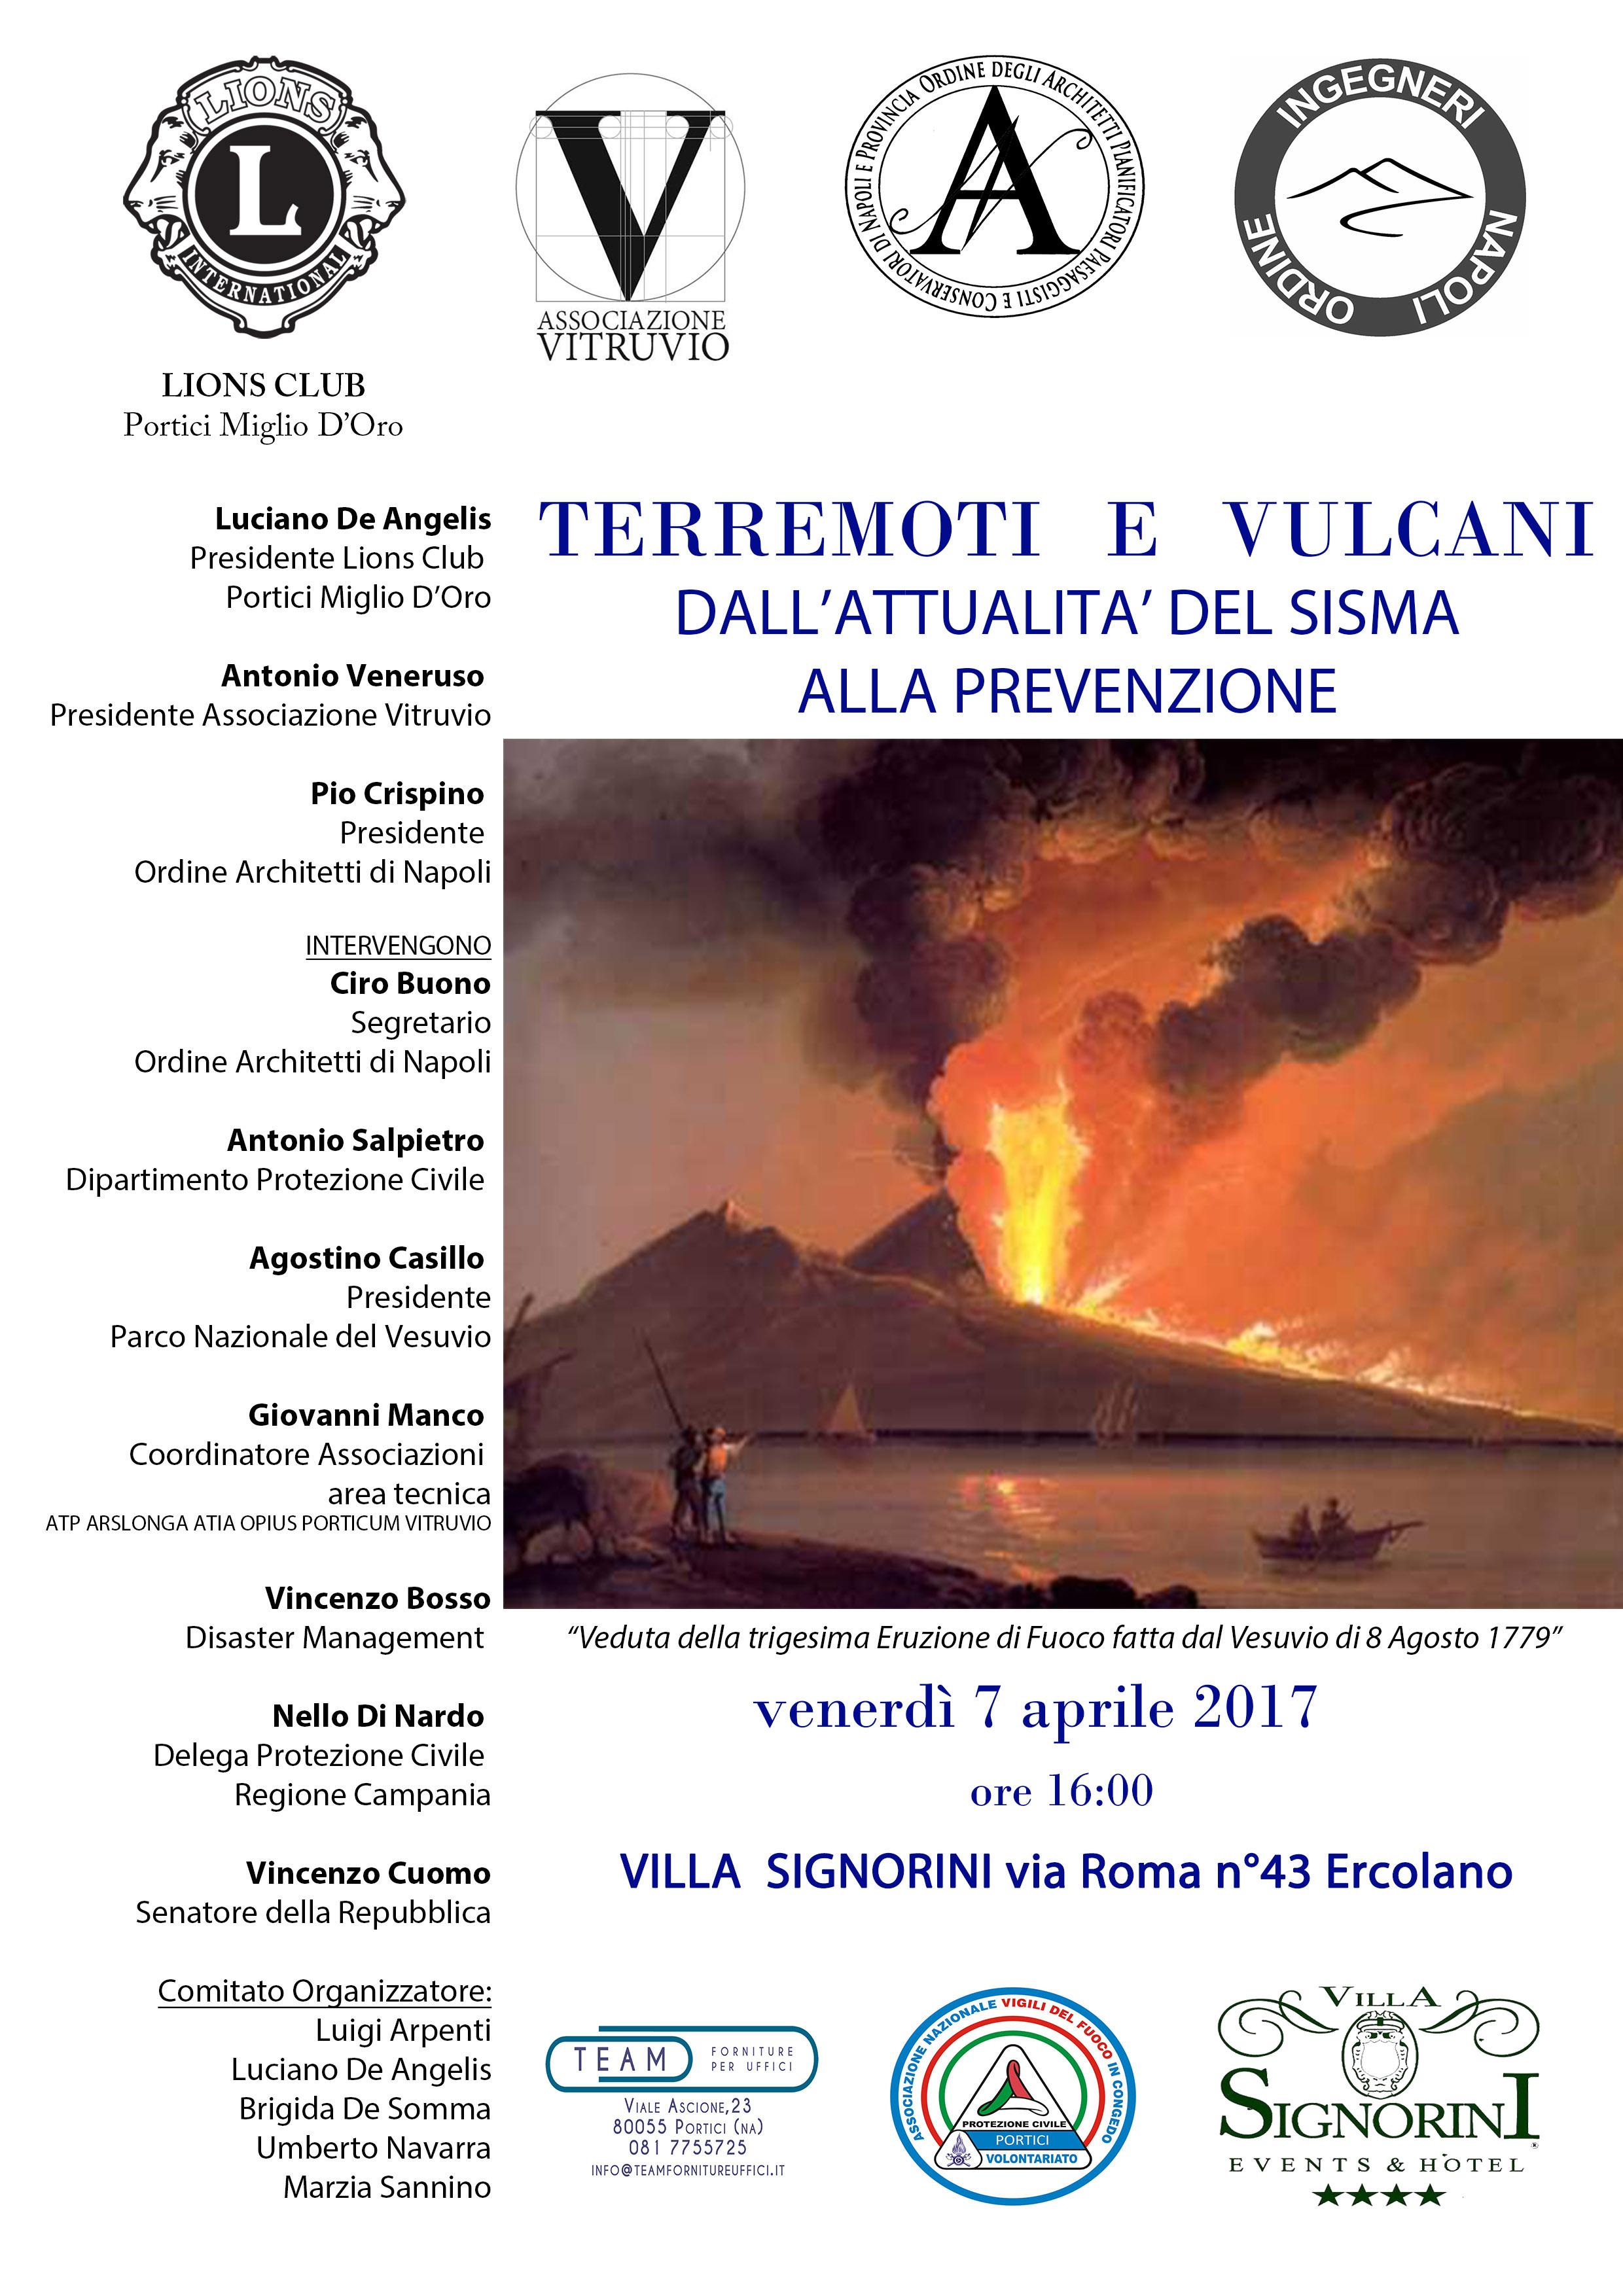 terremoti-e-vulcani